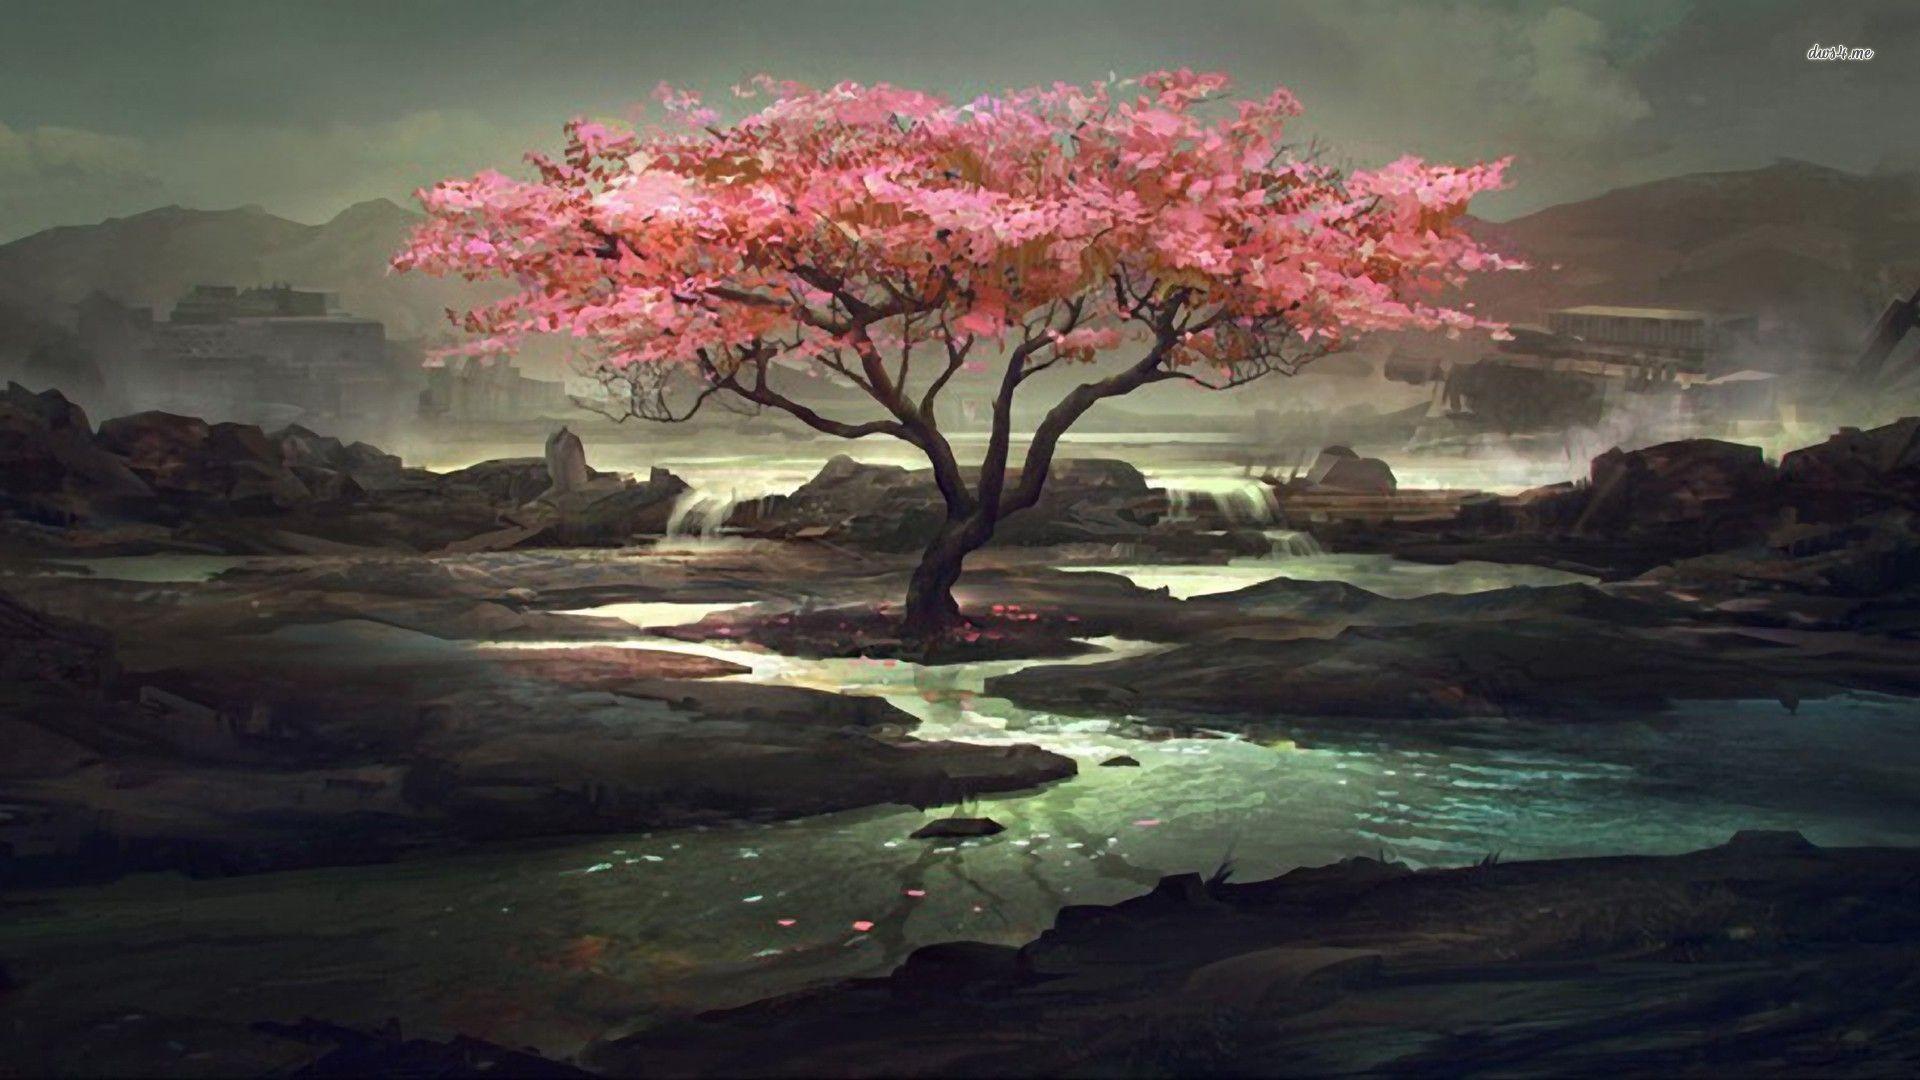 Creekside cherry tree Artistic HD desktop wallpaper, Tree wallpaper, Cherry  wallpaper, Blossom wallpaper, Creek wallpaper – Artistic no.